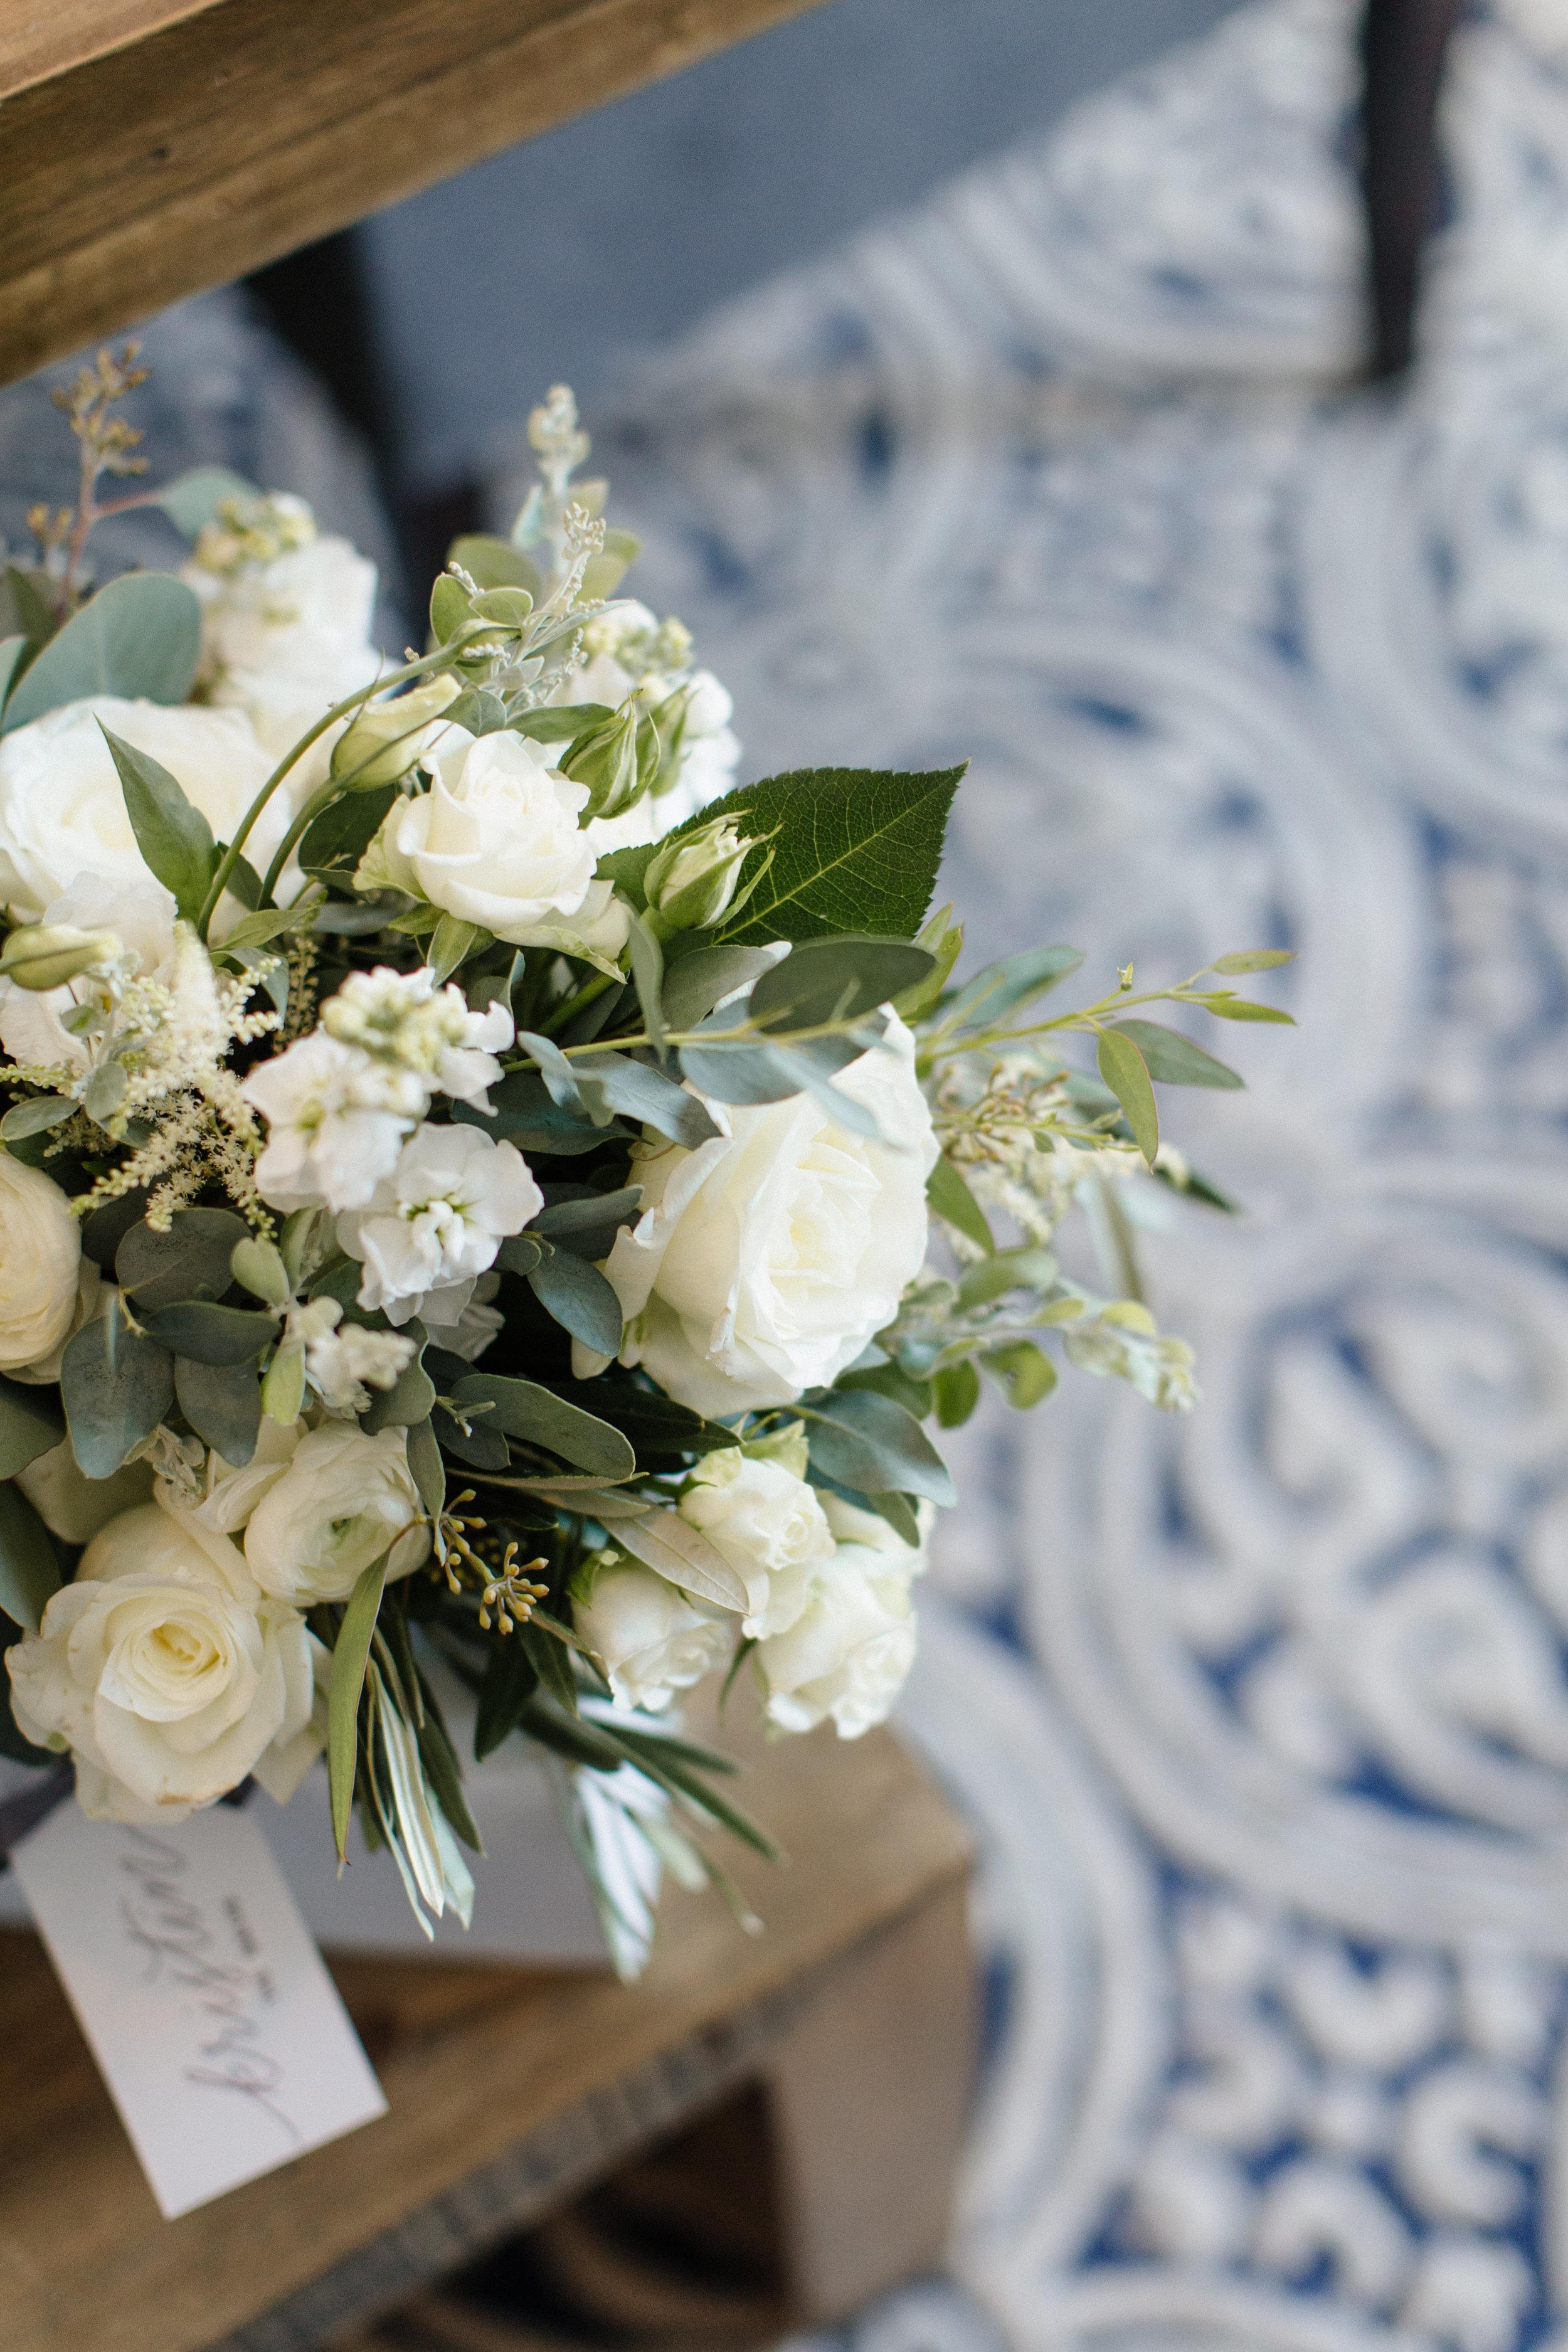 01_jukes_wedding-012.JPG